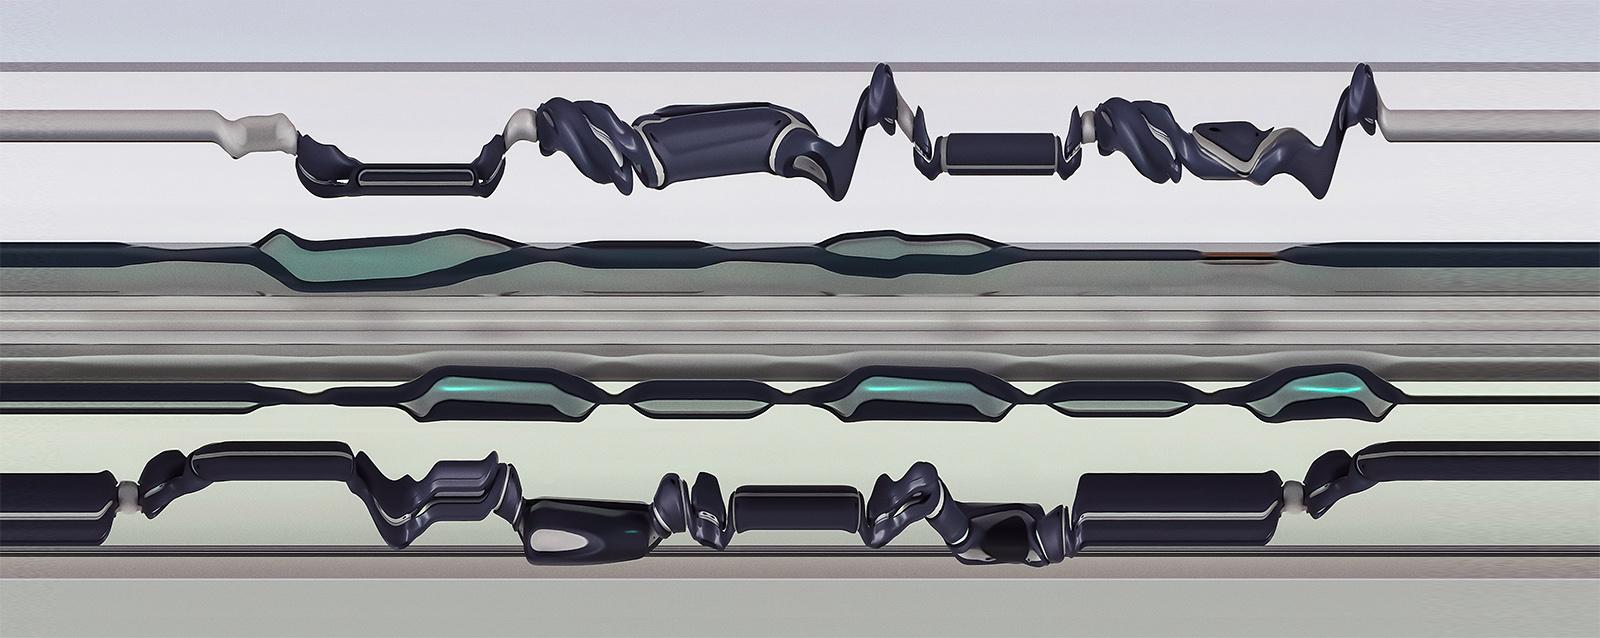 YuMi IRB 14000 01, 2020, 100 x 250 cm (39.3 x 98.4 in.)